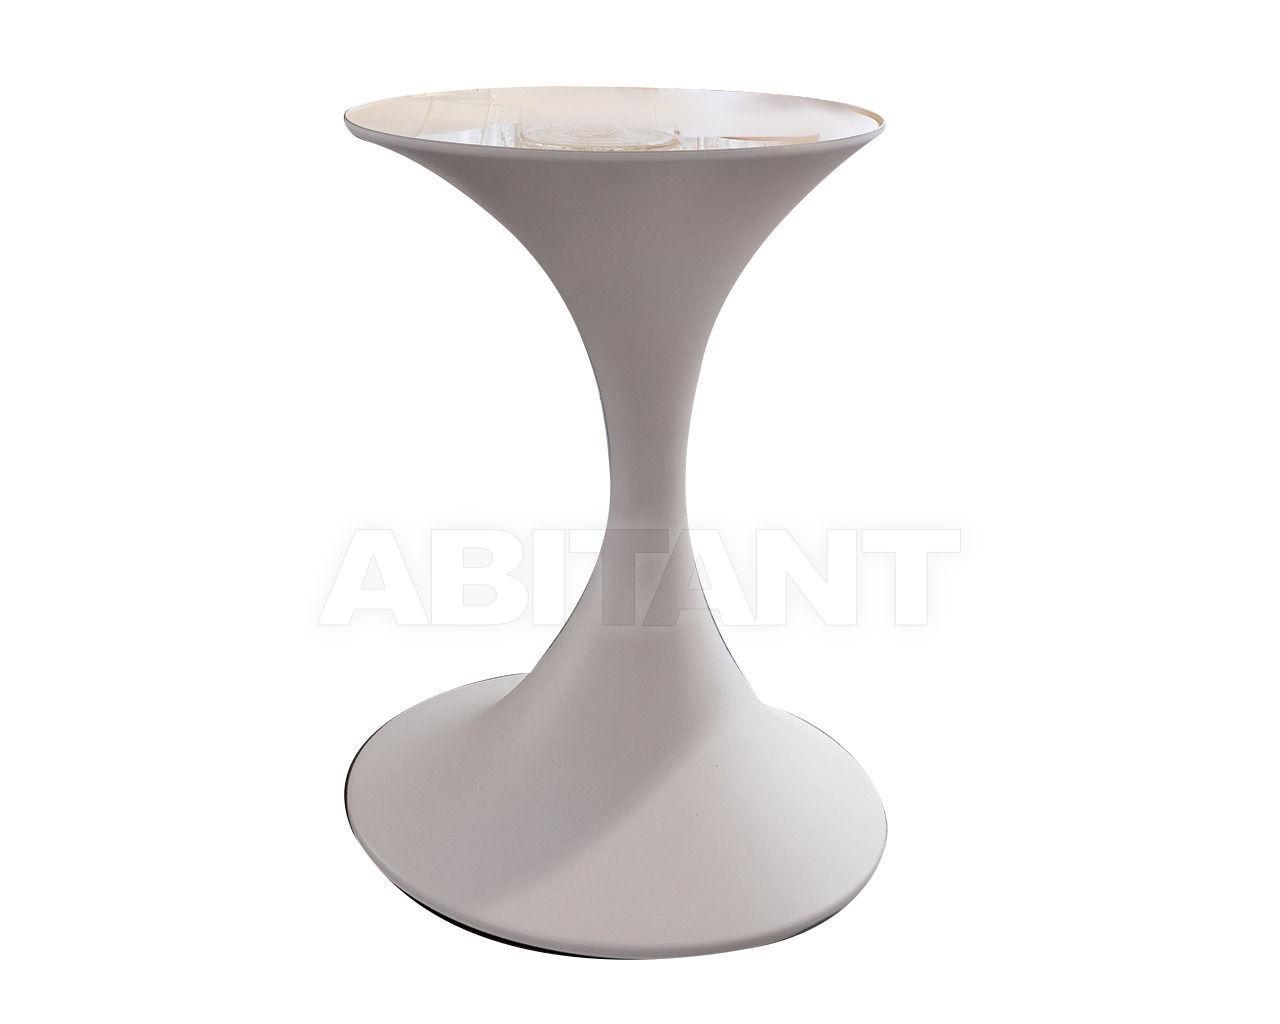 Купить Столик кофейный Andorra  Tonin Casa Rossa 6293 V101